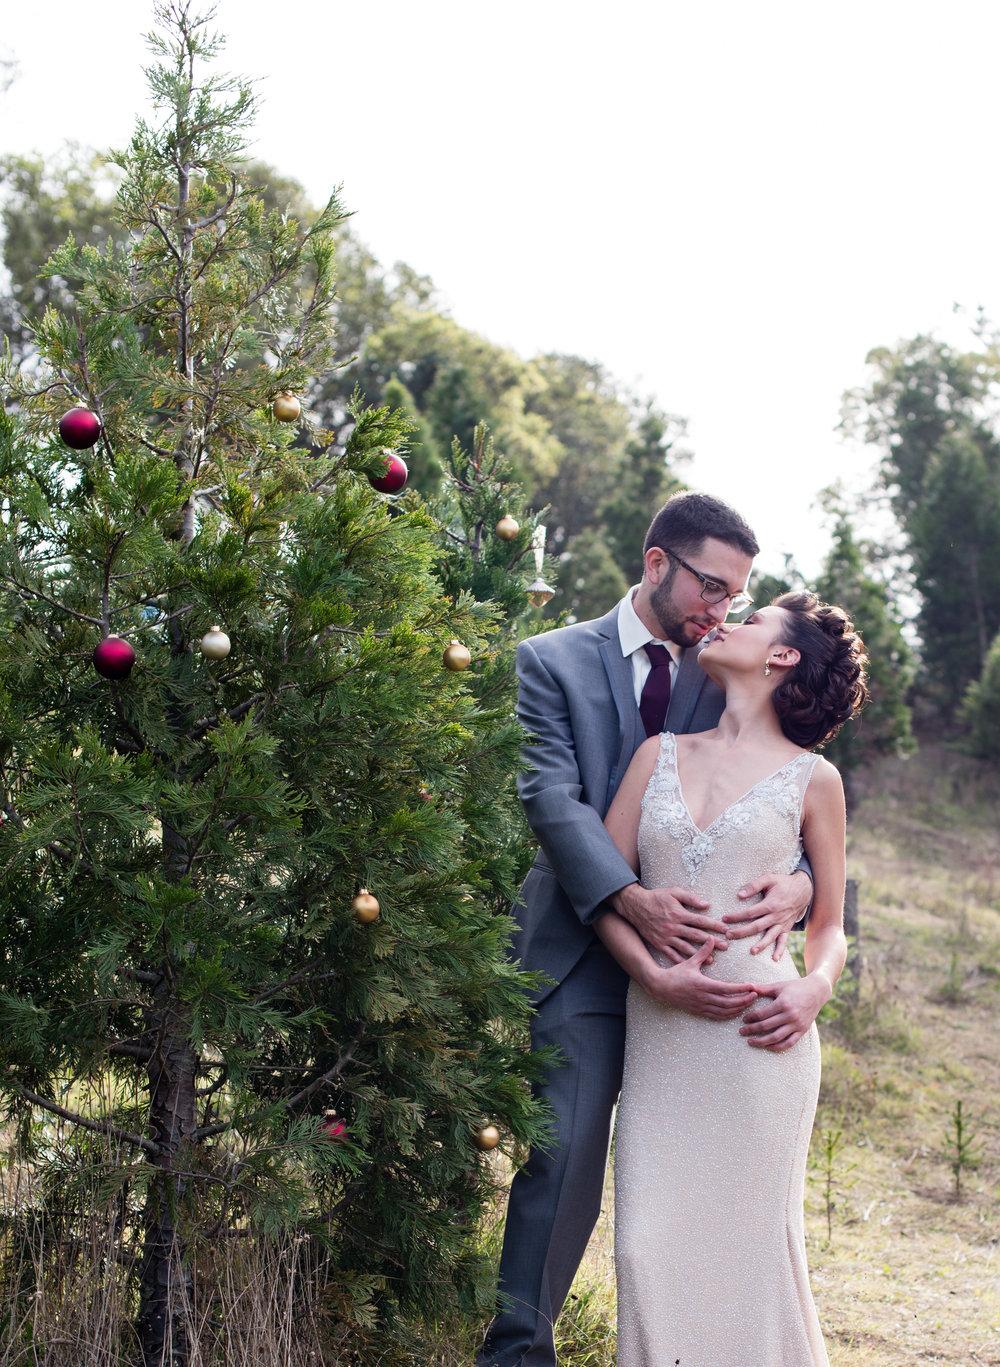 www.santabarbarawedding.com   Carrie Pollard Photography   Church's Christmas Trees   Bride and Groom and Christmas Tree